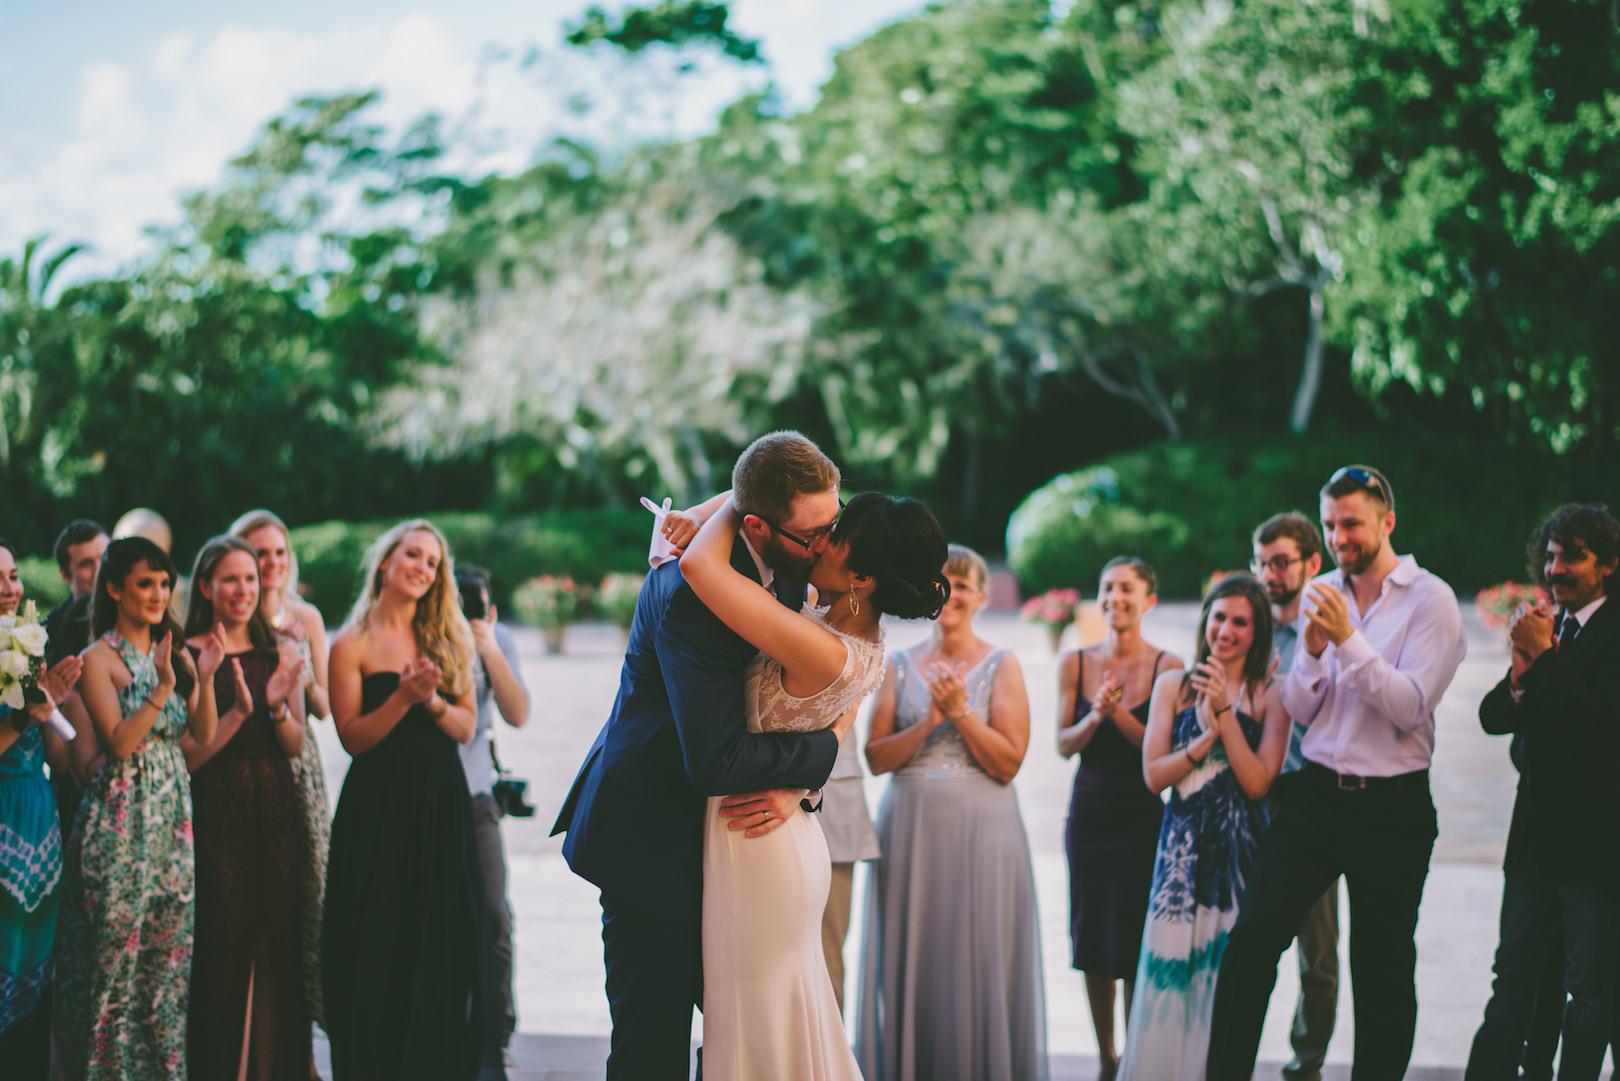 Nathan & Felicia - Wedding Day - © Dallas Kolotylo Photography - 348